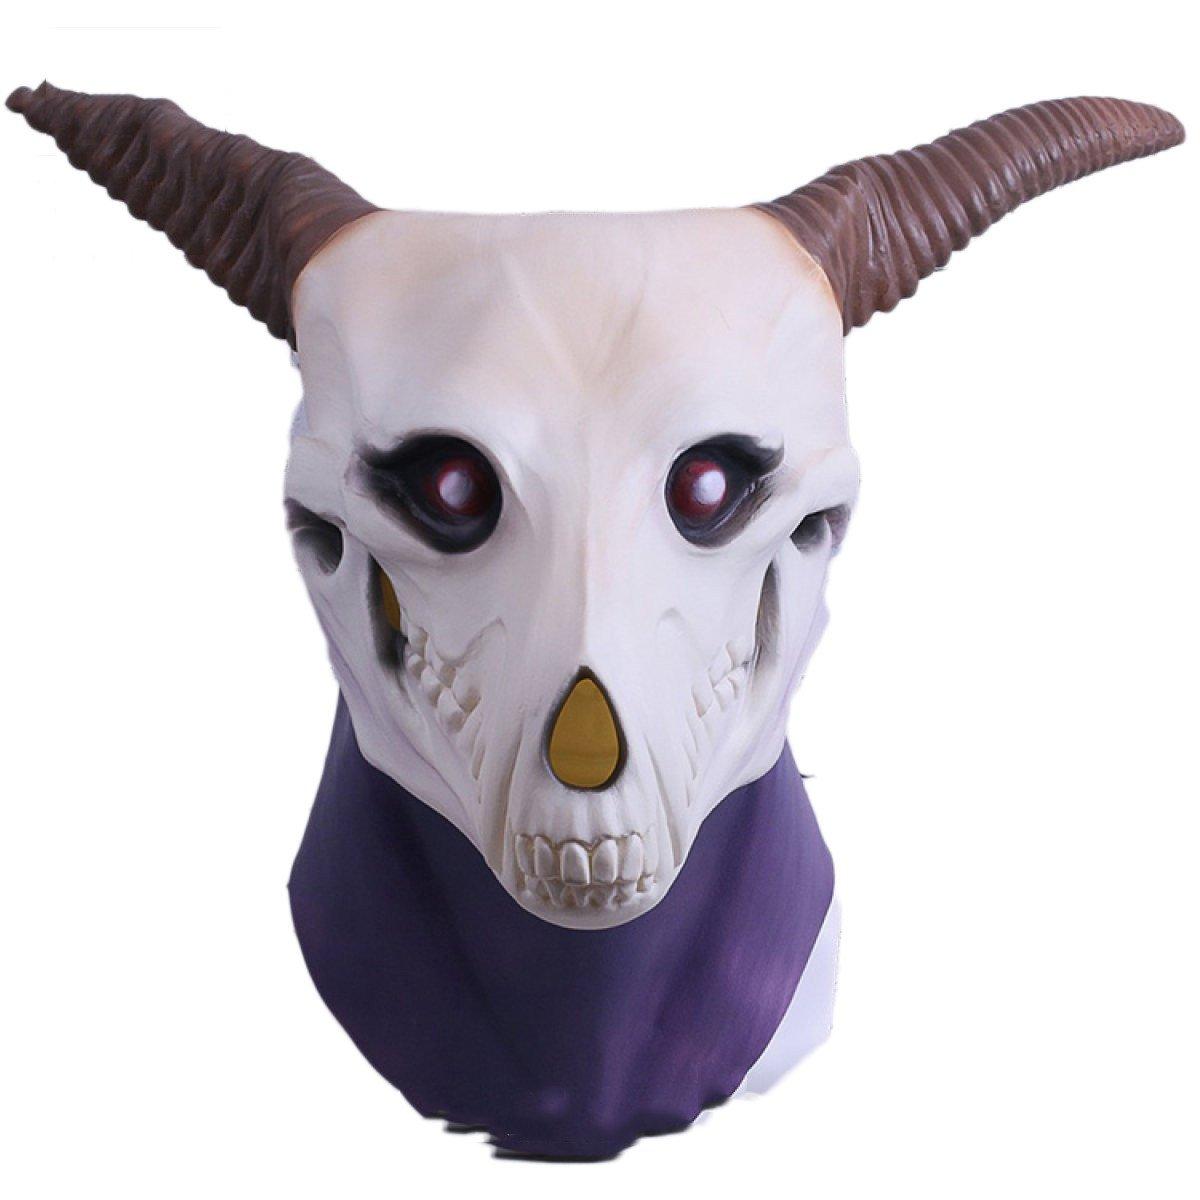 Cosplay Mask Mask Enchanted Bride Elias Entrepreneurs Hood Mask Halloween Performance Props Cos,MagicMakeMask-OneSize